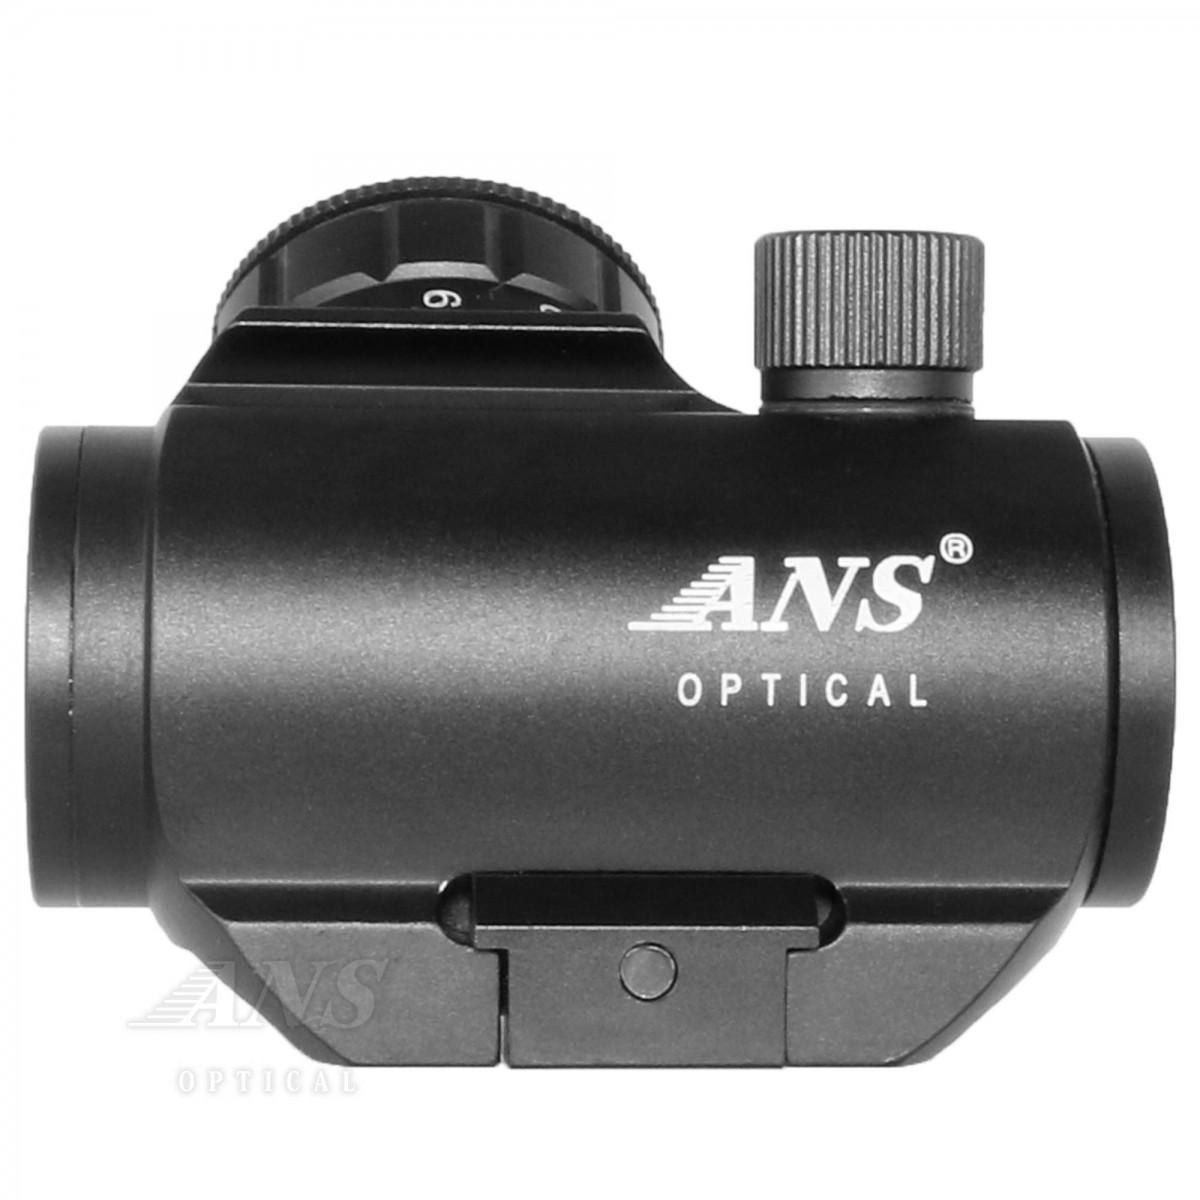 ANS optical TRS-25タイプ 1x20 ドットサイト ダットサイト 赤 緑 斜めイルミネーションダイヤル